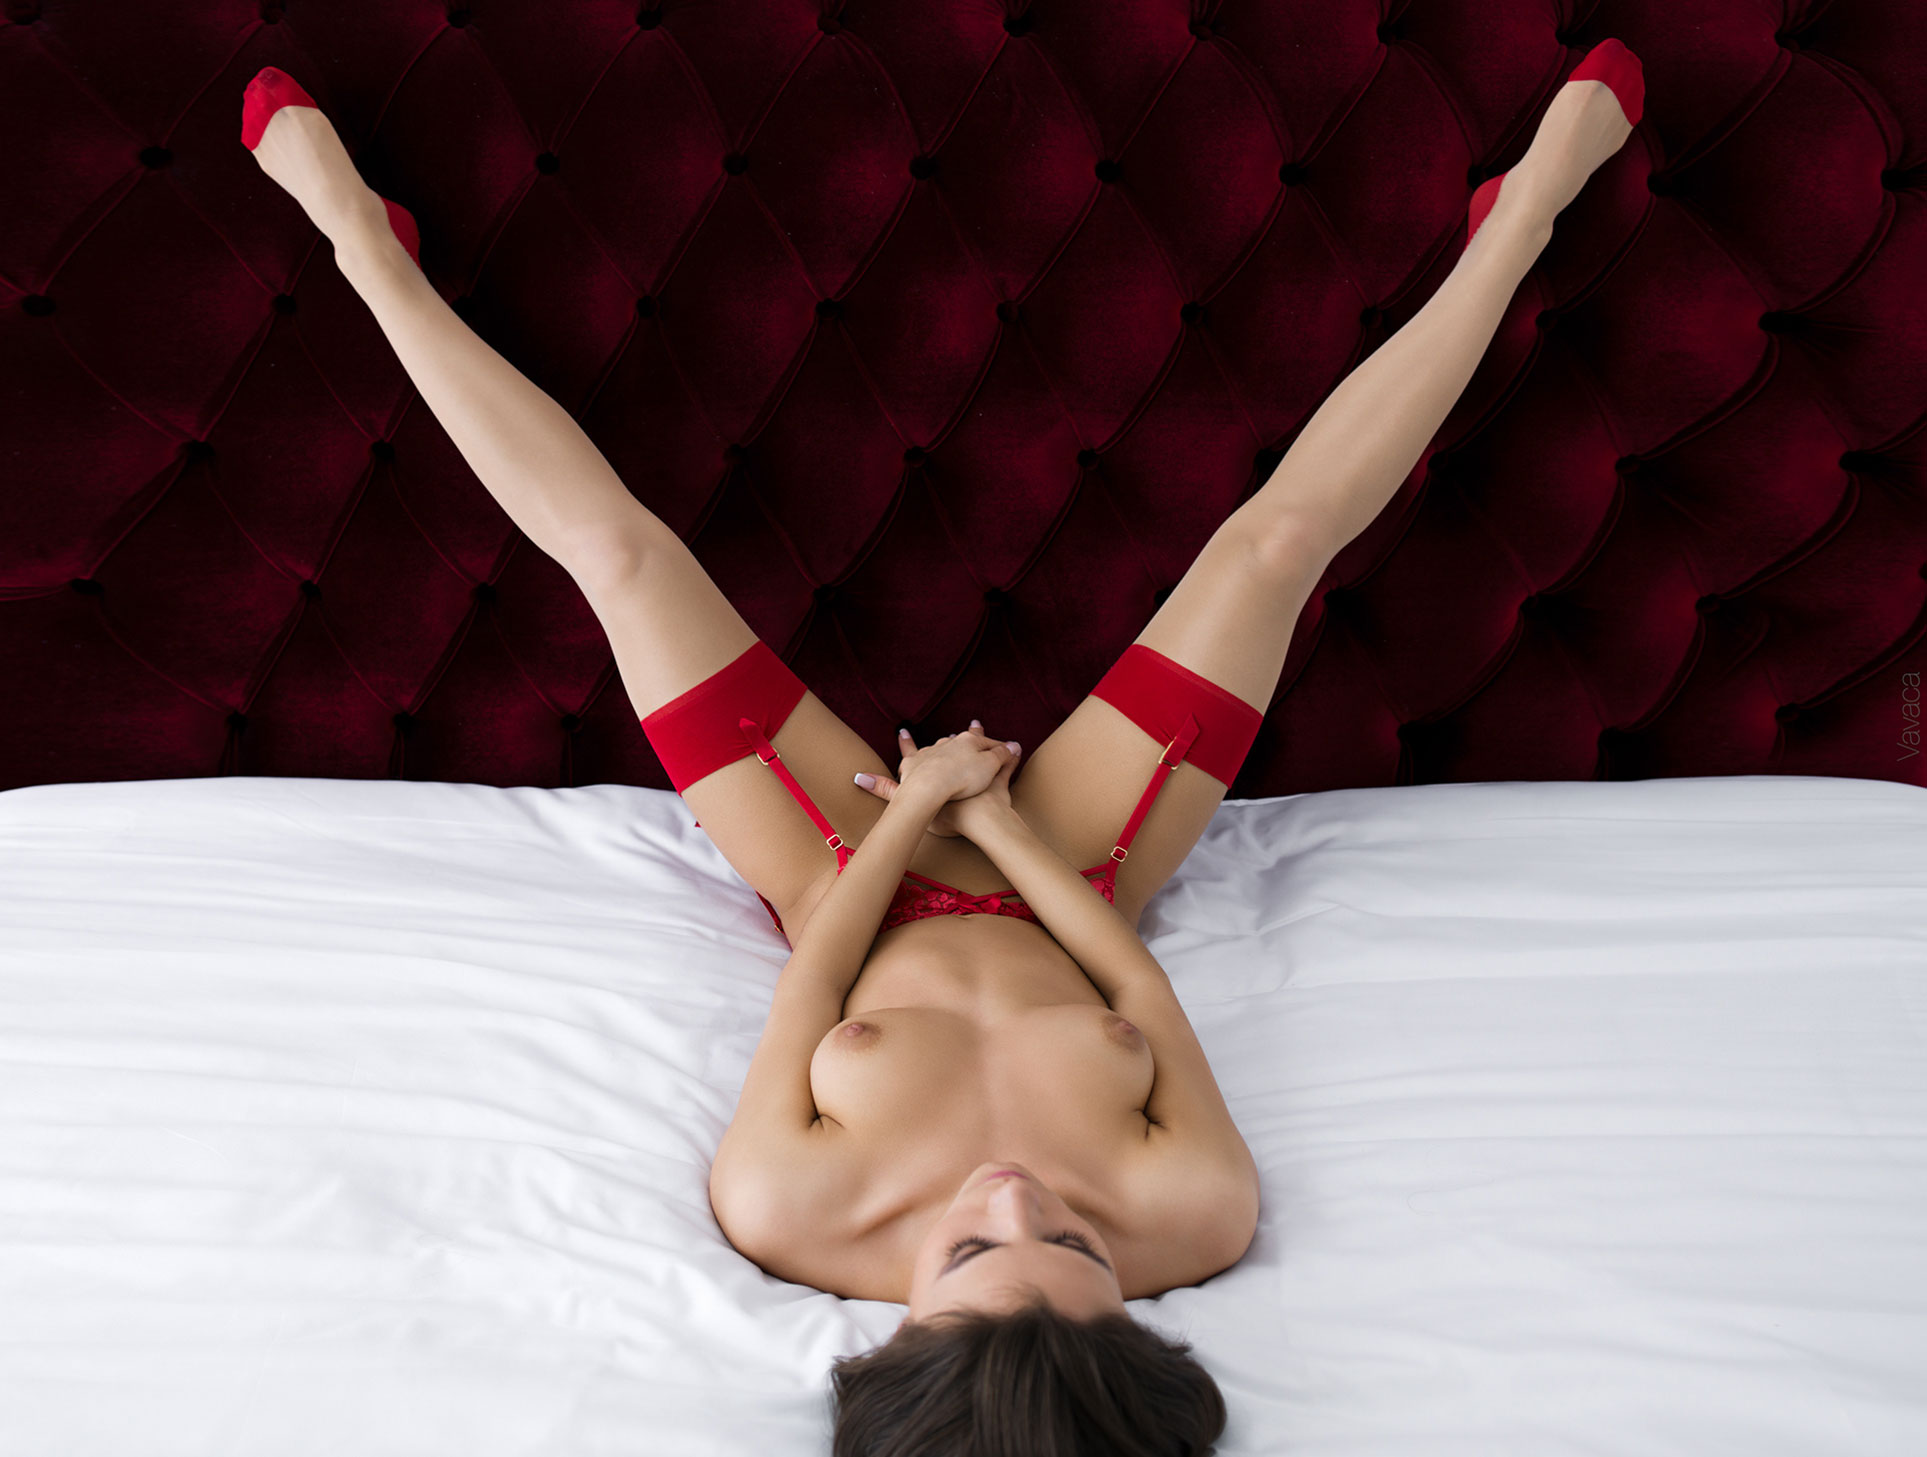 Обнаженная в красном белье - Кристина Макарова / Kristina Makarova by Vladimir Nikolaev